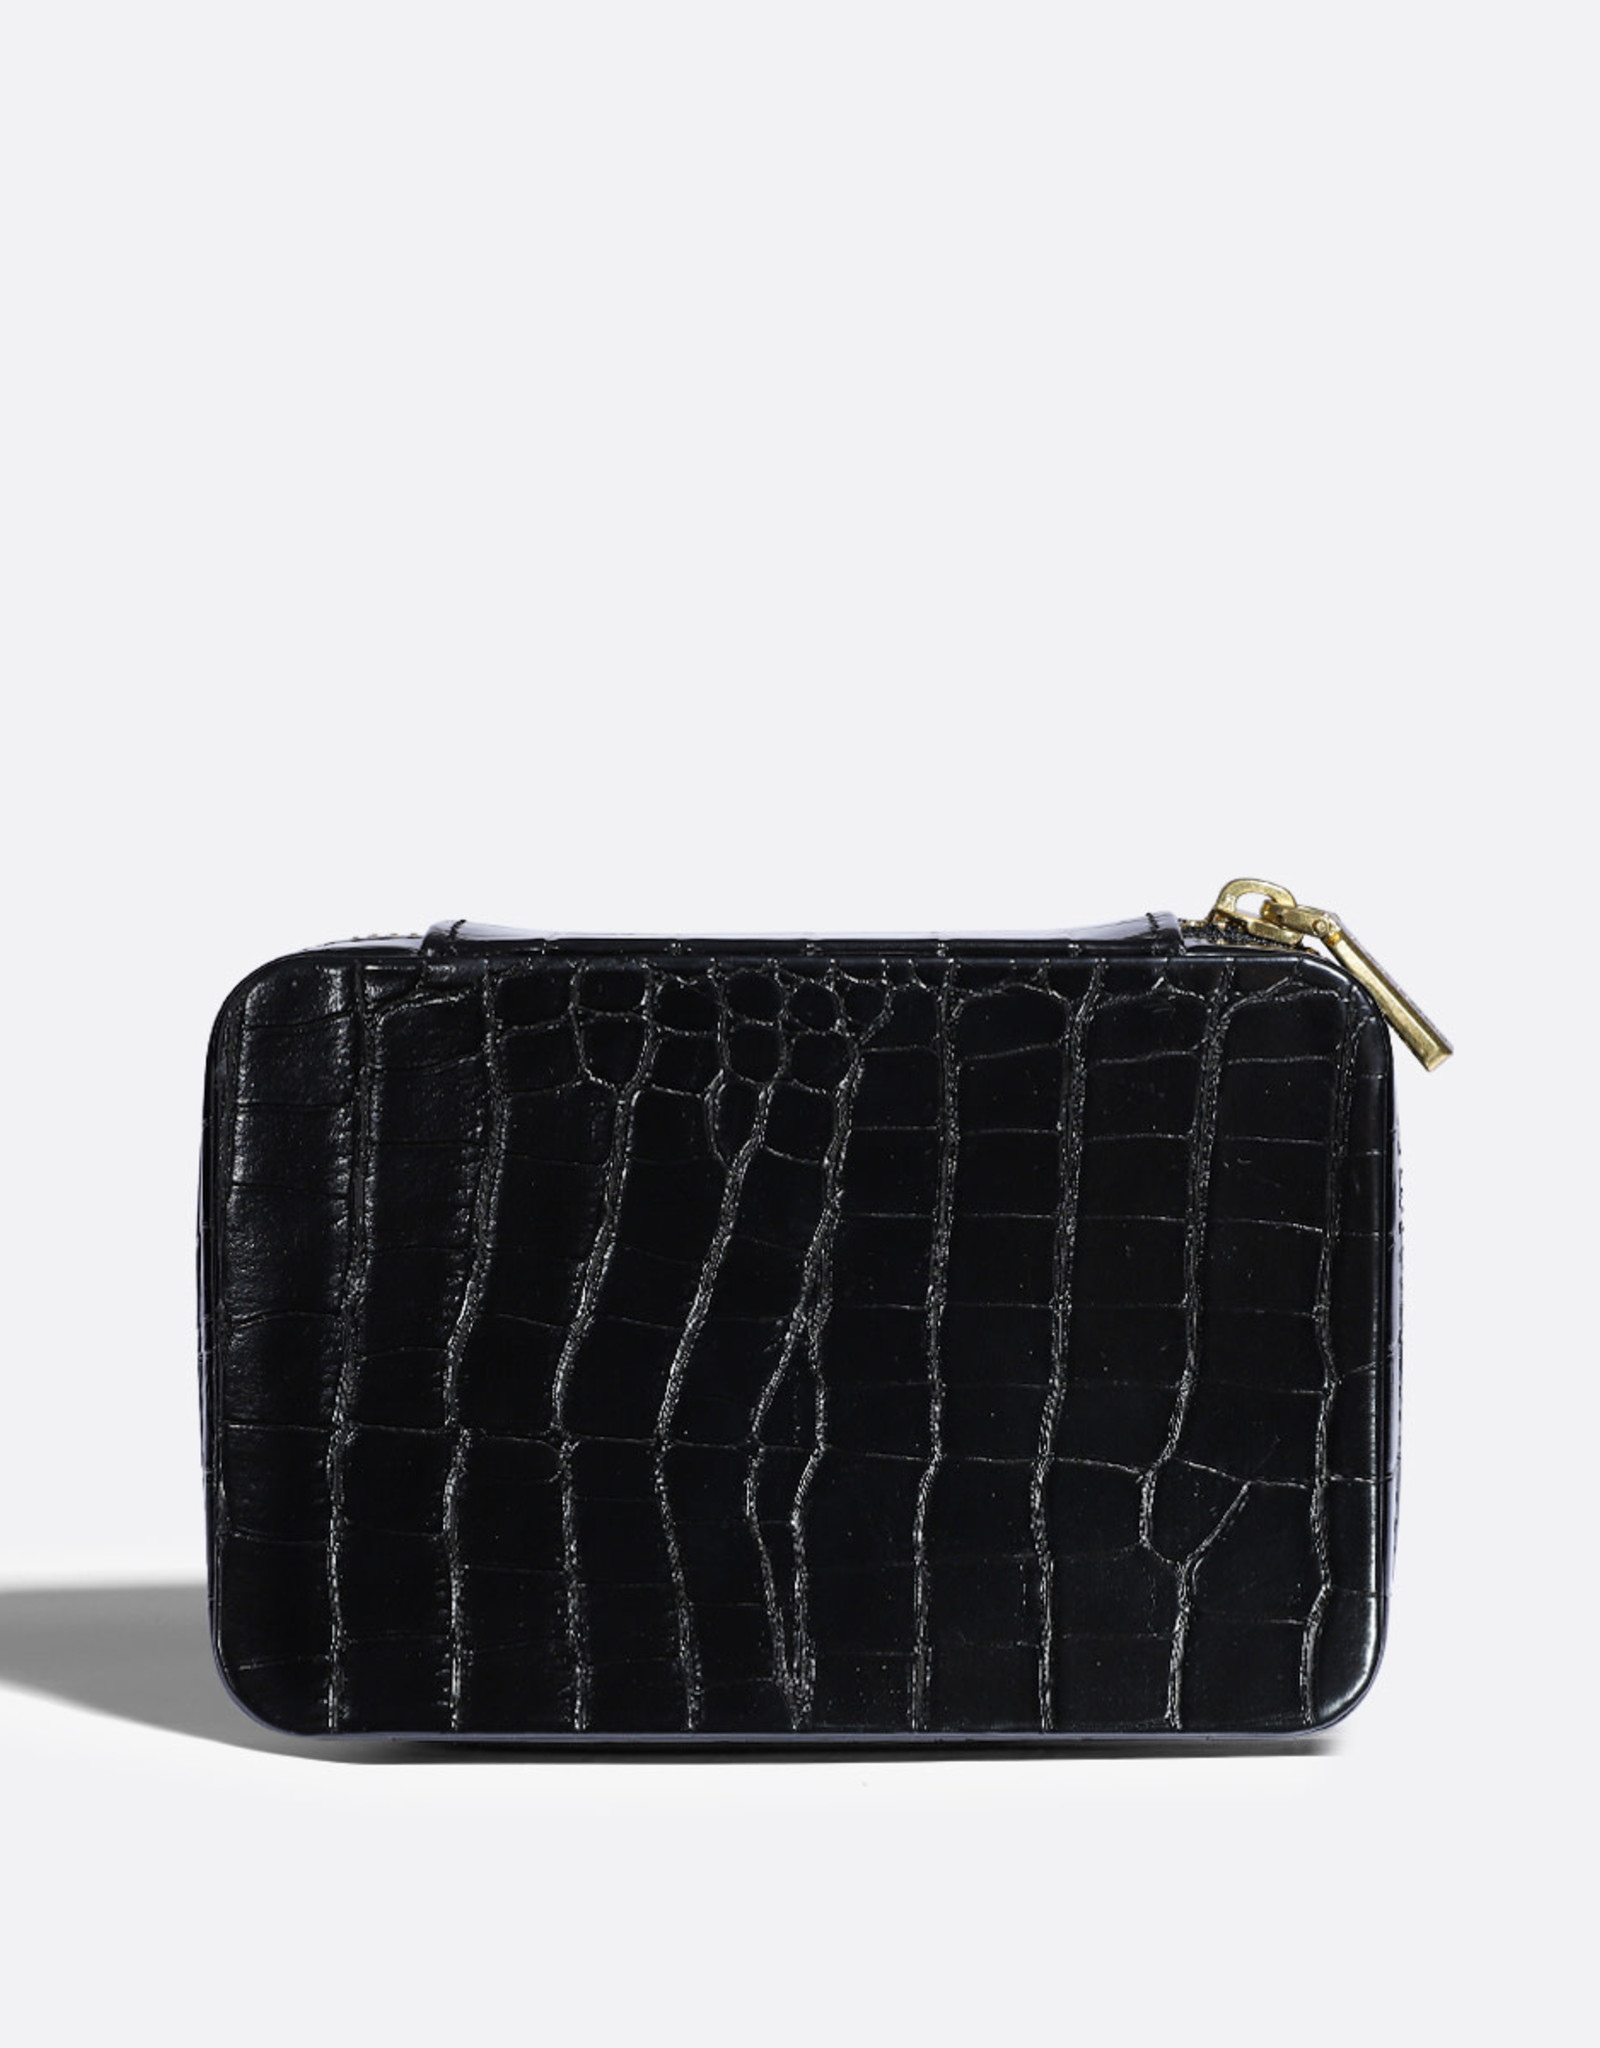 PIXIE MOOD Blake Jewelry Case – Black Croc